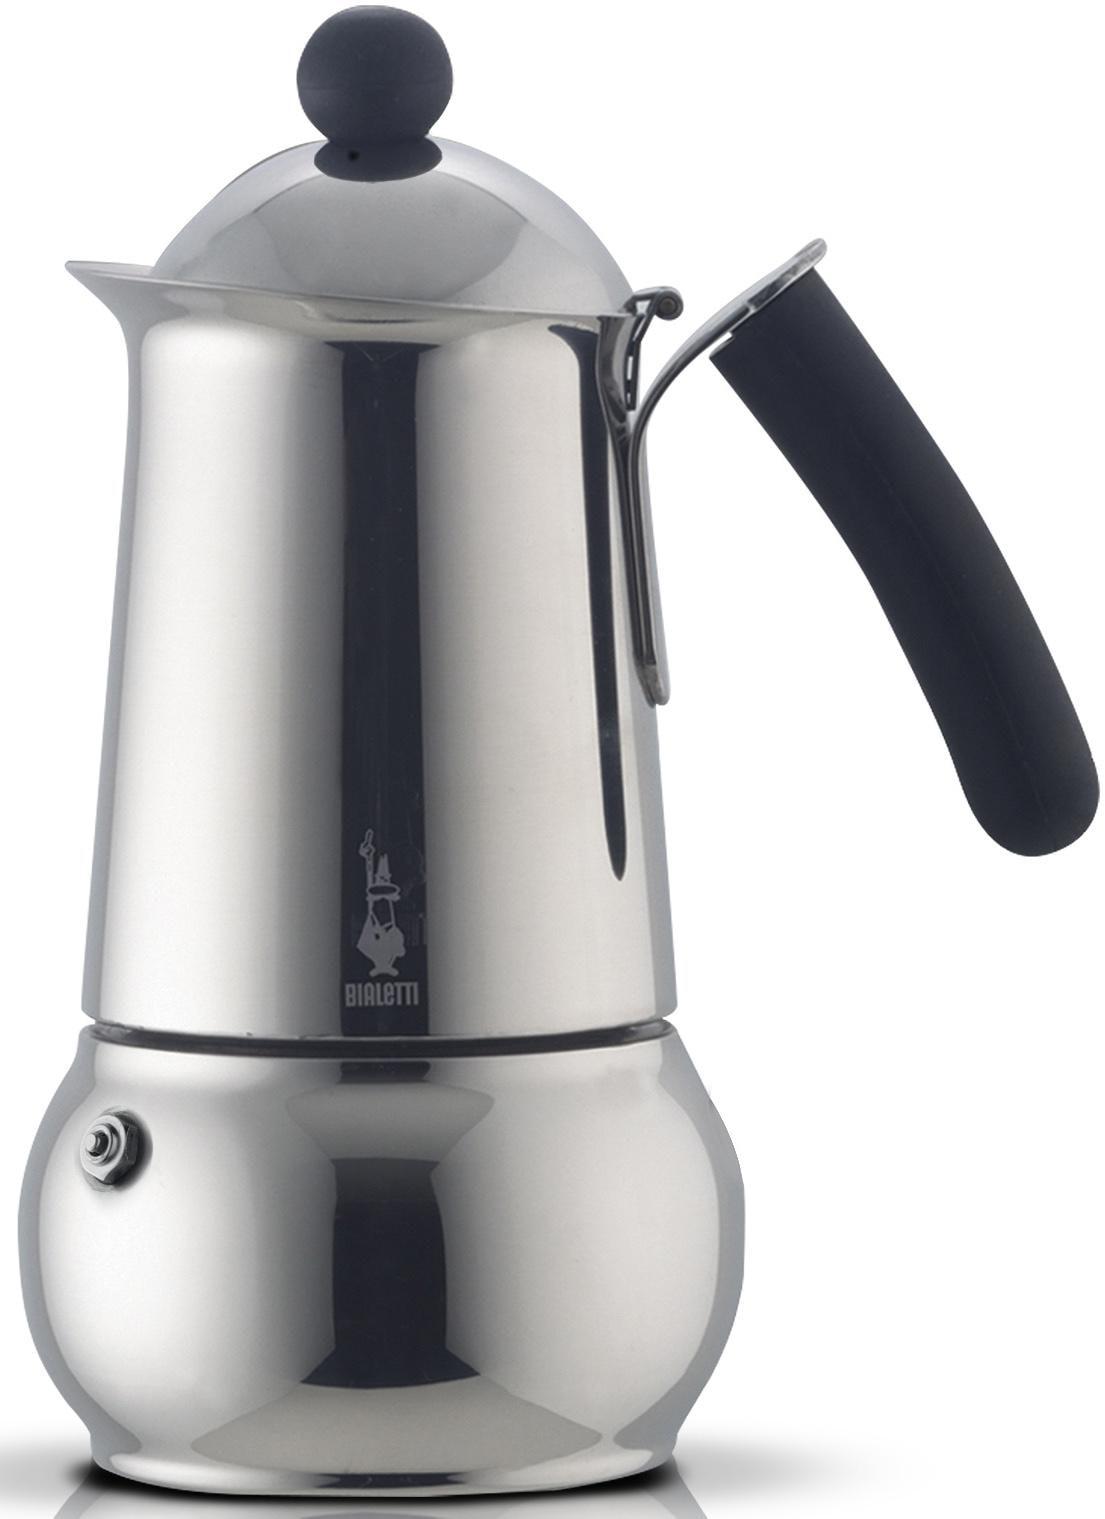 BIALETTI Espressokocher, Edelstahl,  CLASS  Preisvergleich